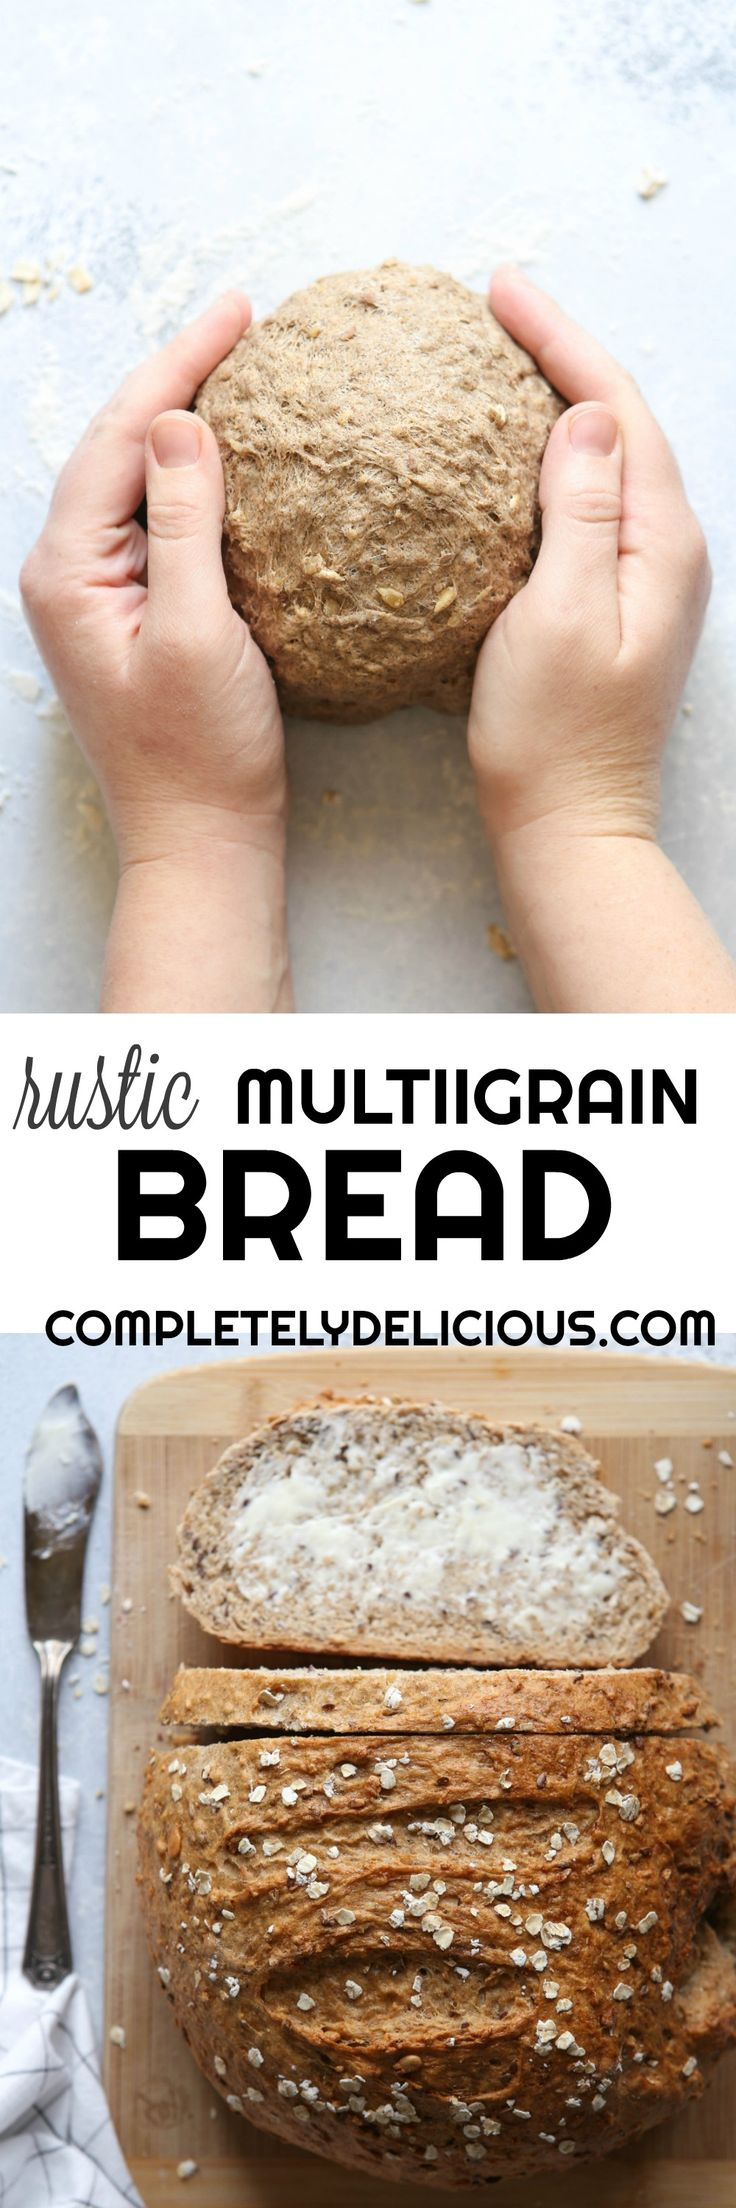 Rustic Multigrain Bread